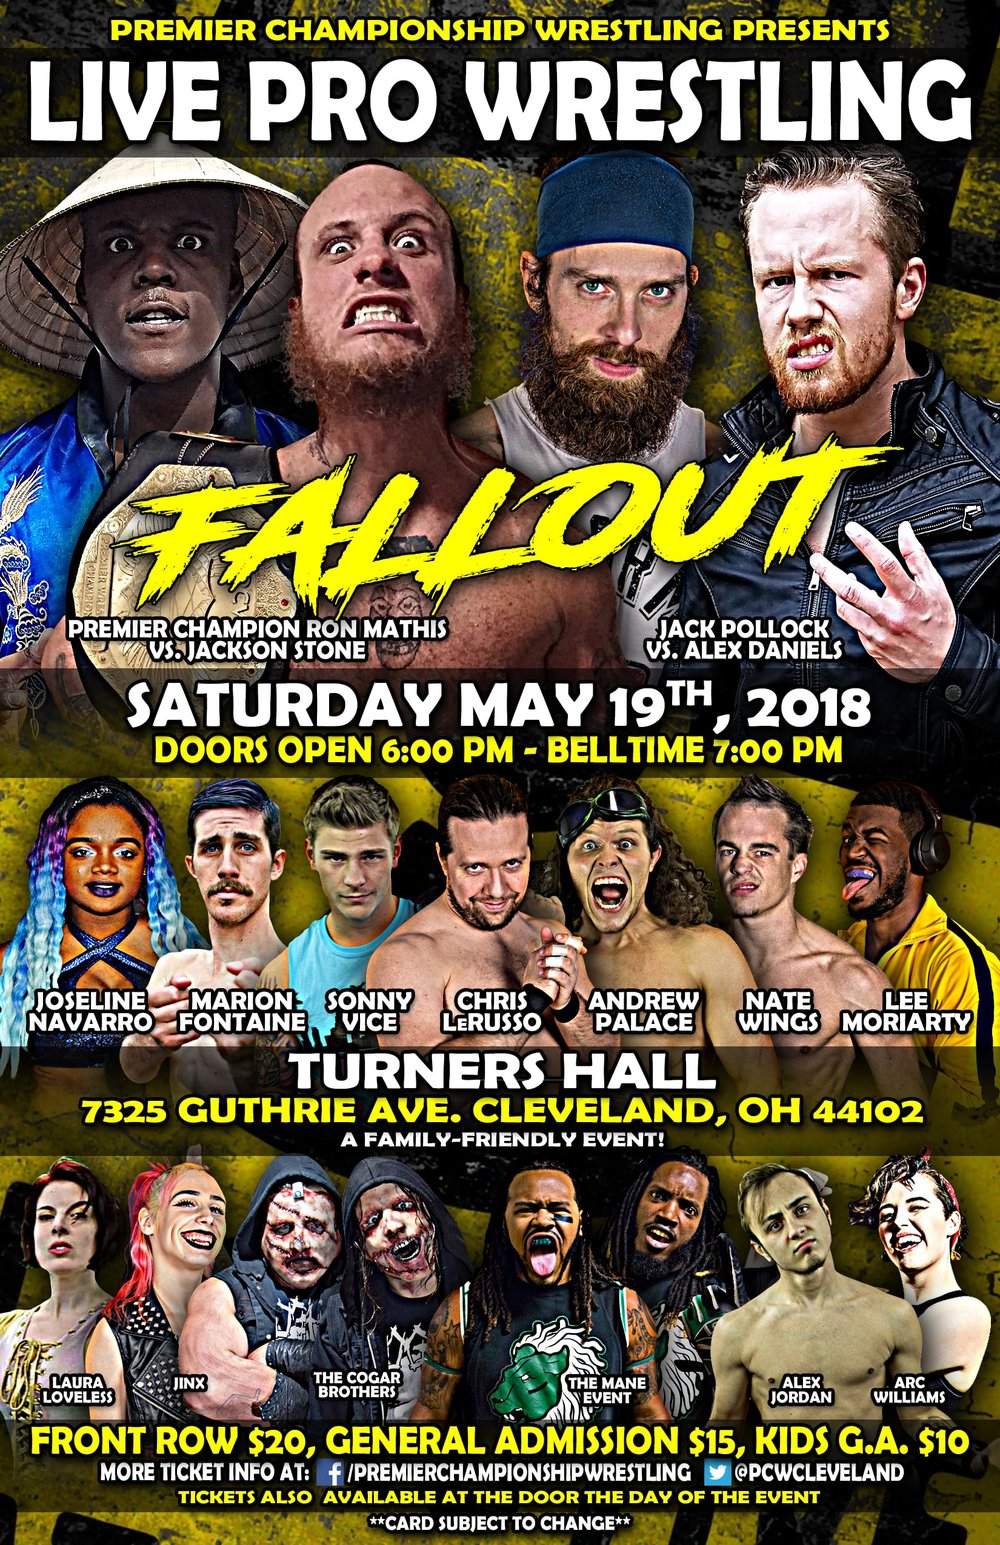 Premier Championship Wrestling - Fallout 2018